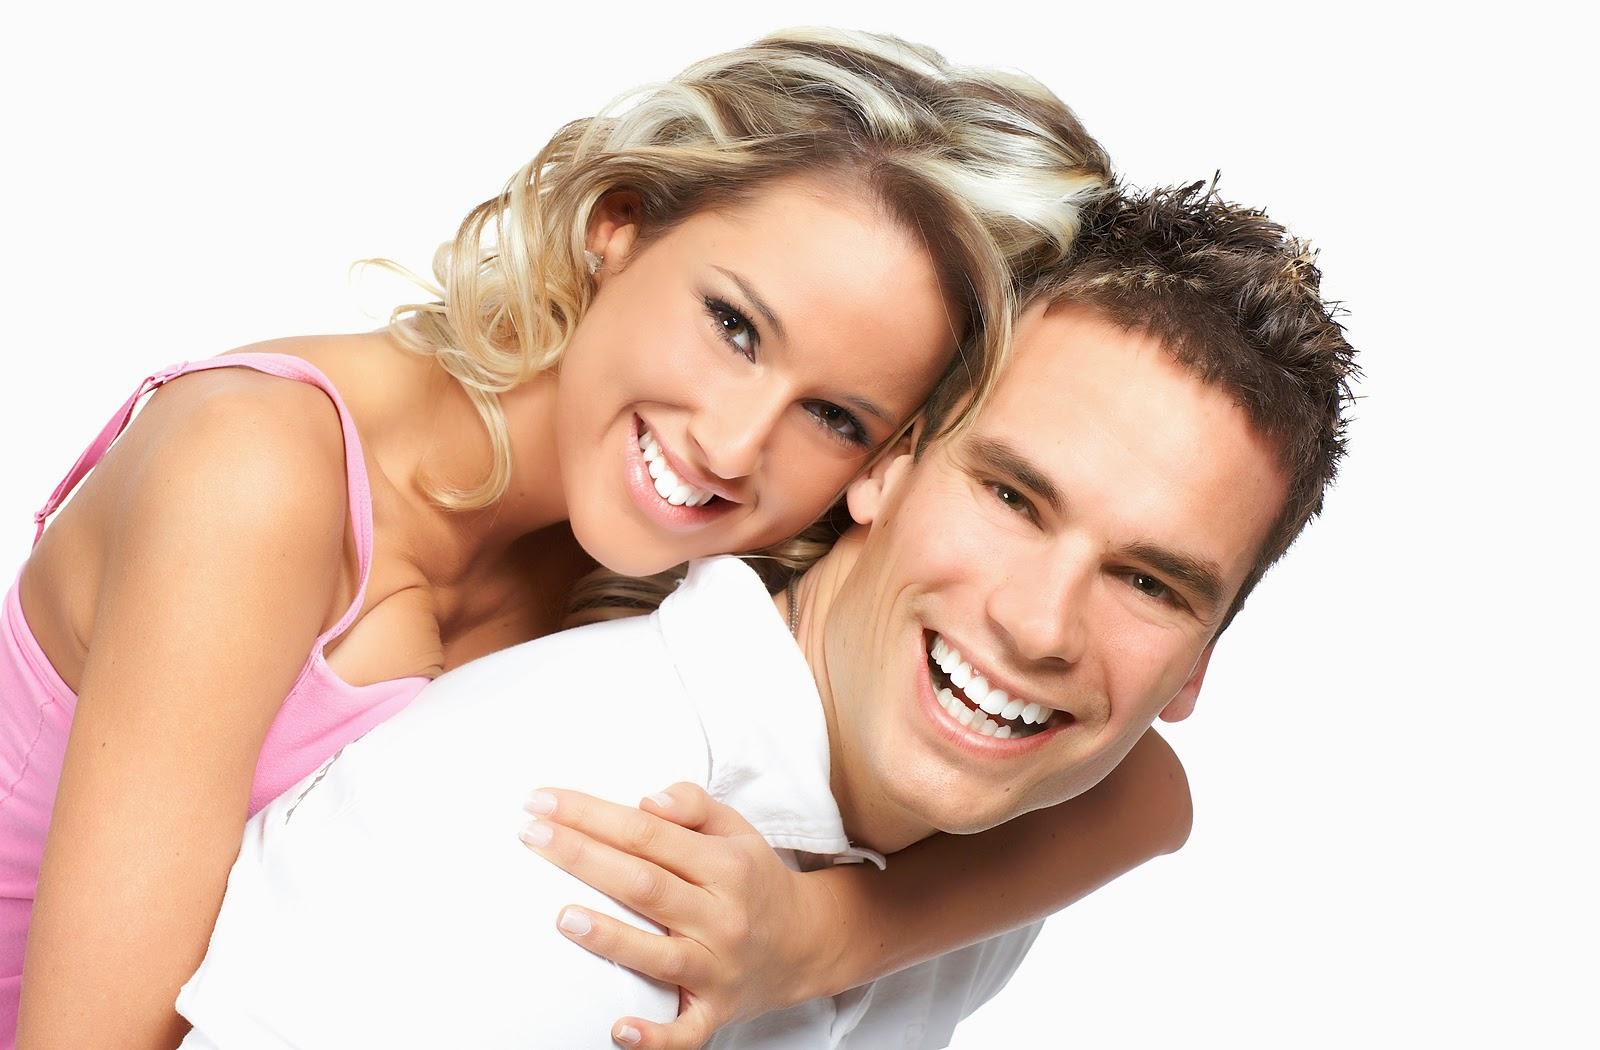 topp 10 dating sites 18 ungdomsporno